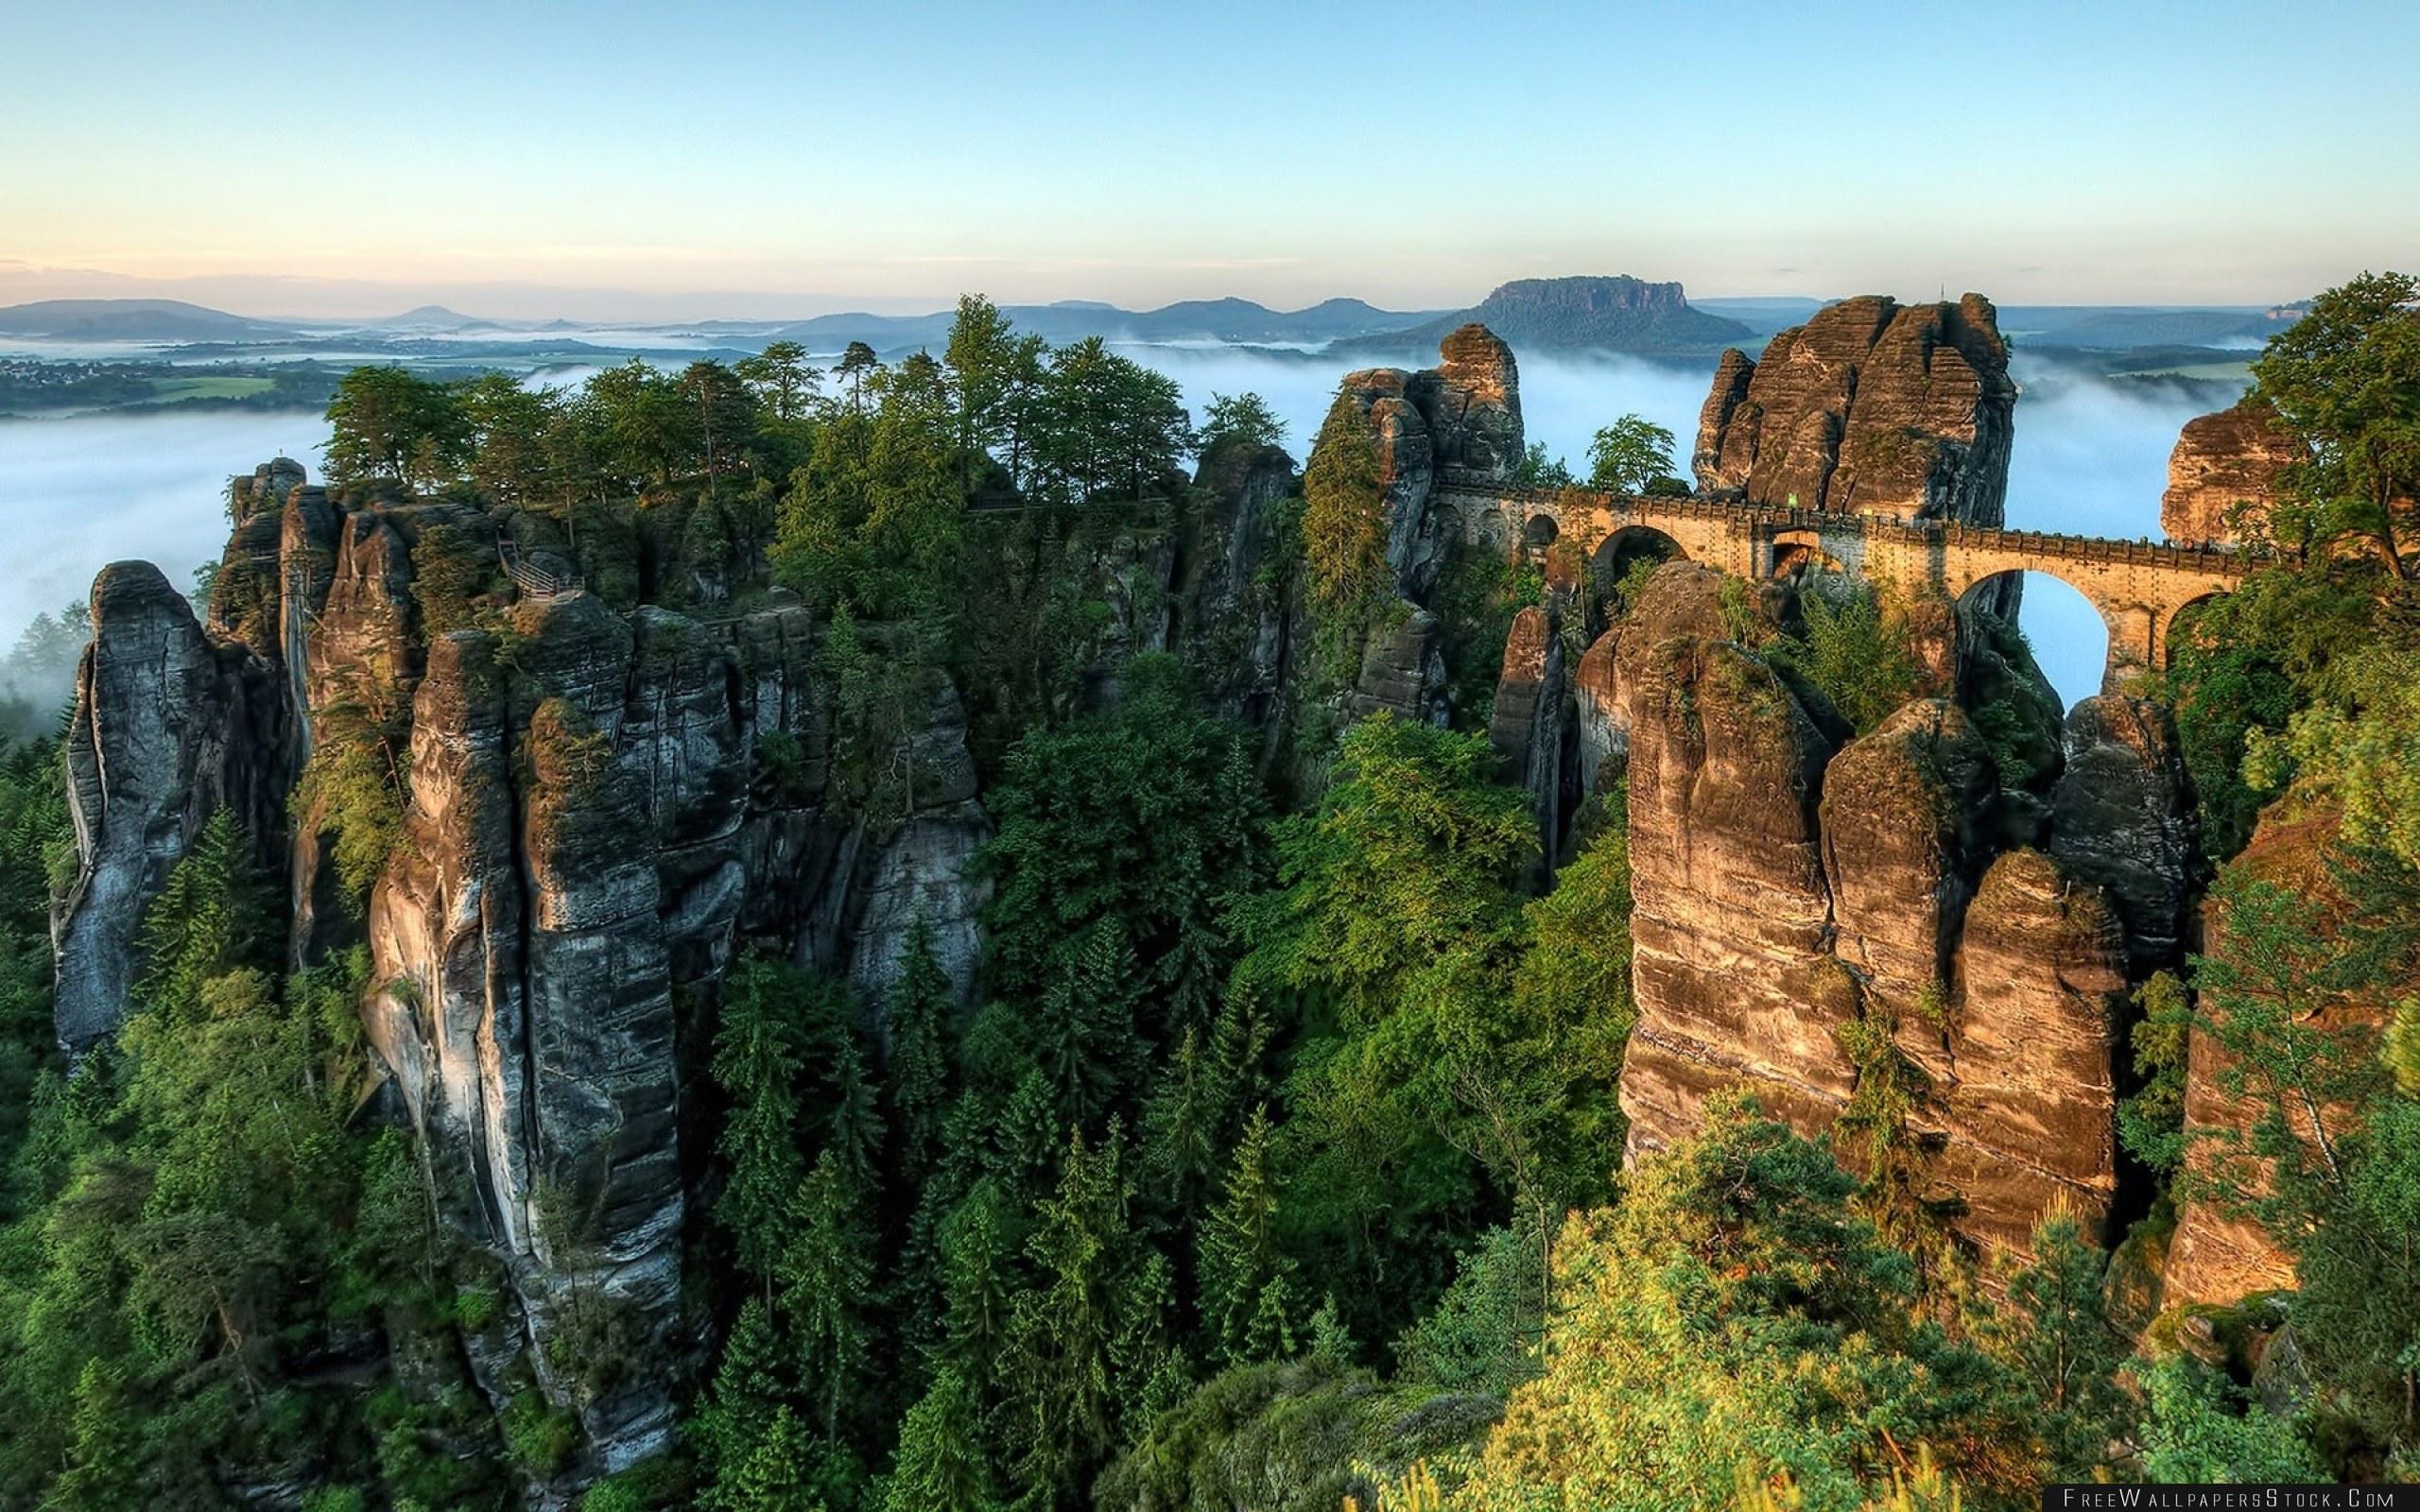 Download Free Wallpaper Bridge Rocks Height Wood Pine Clouds Harmony